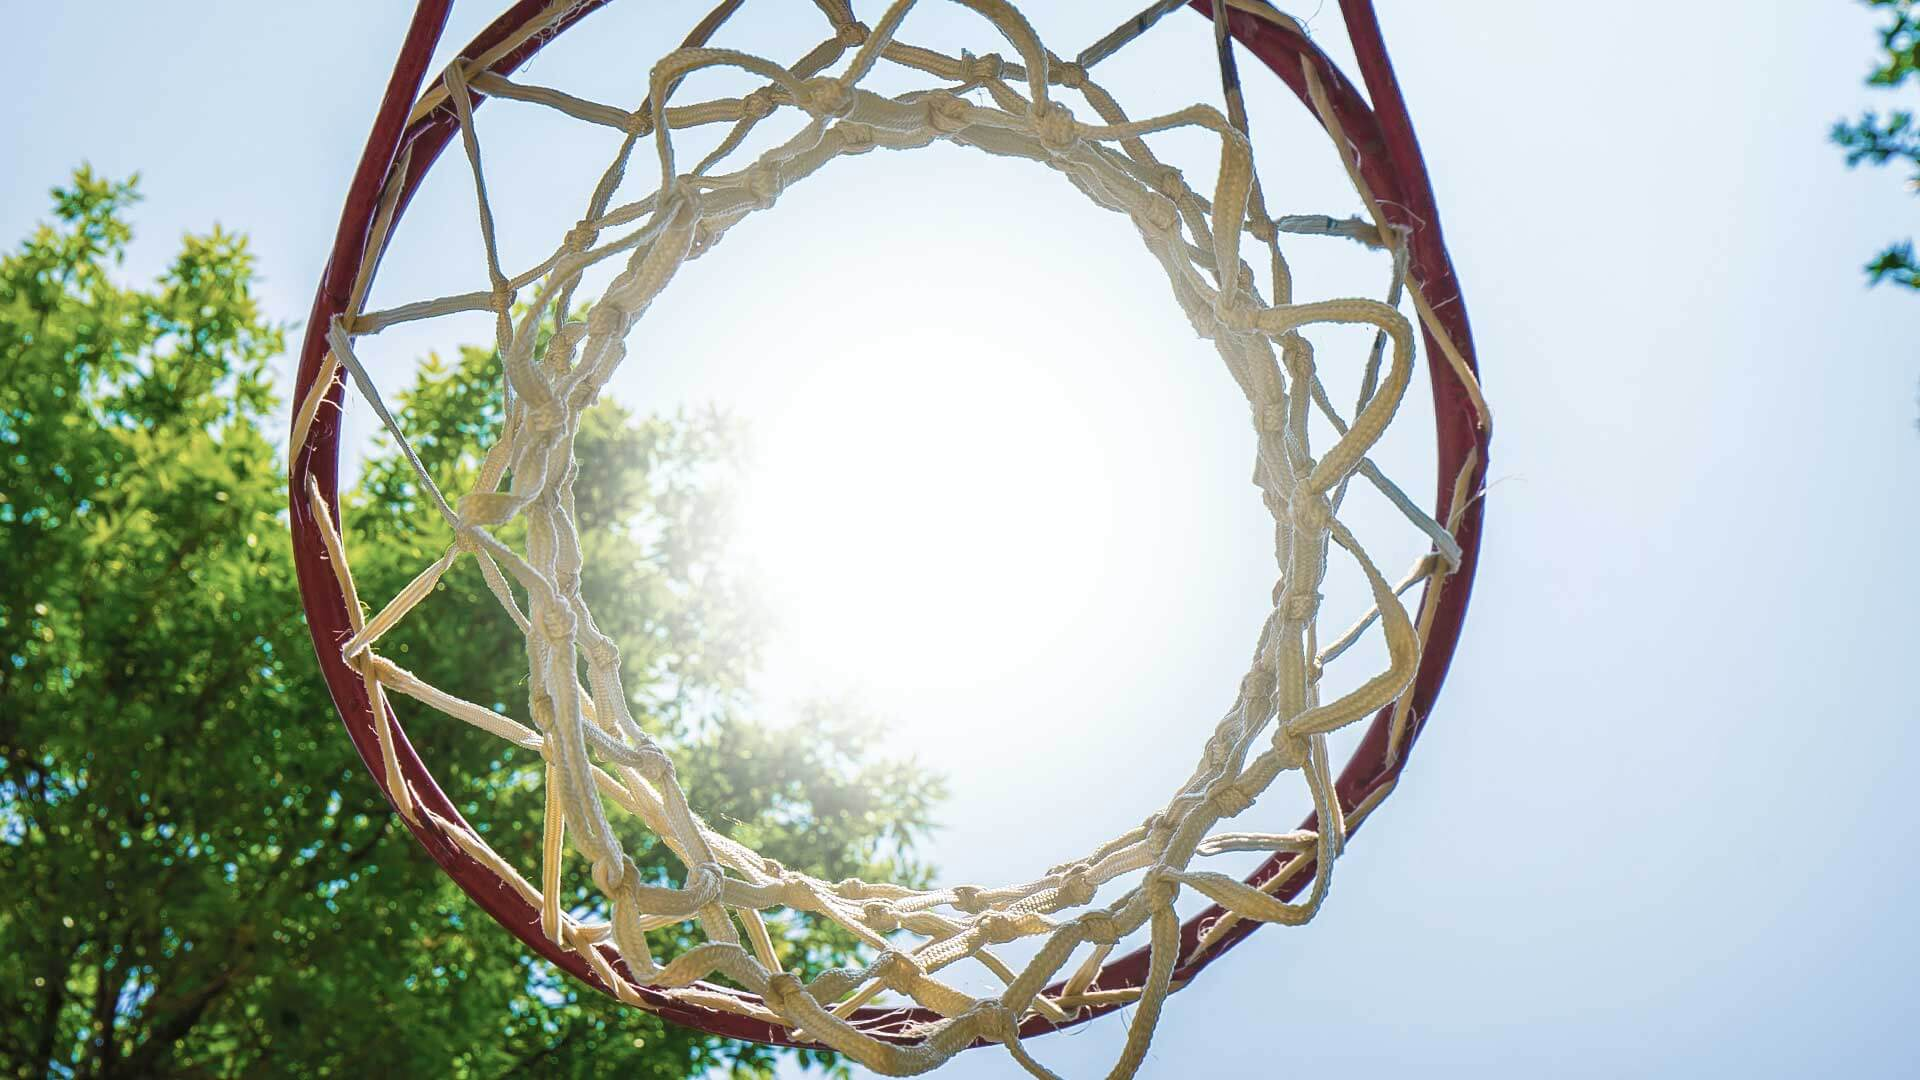 Citaten Hoop Research : Hook shot hoops by kennedy ryan